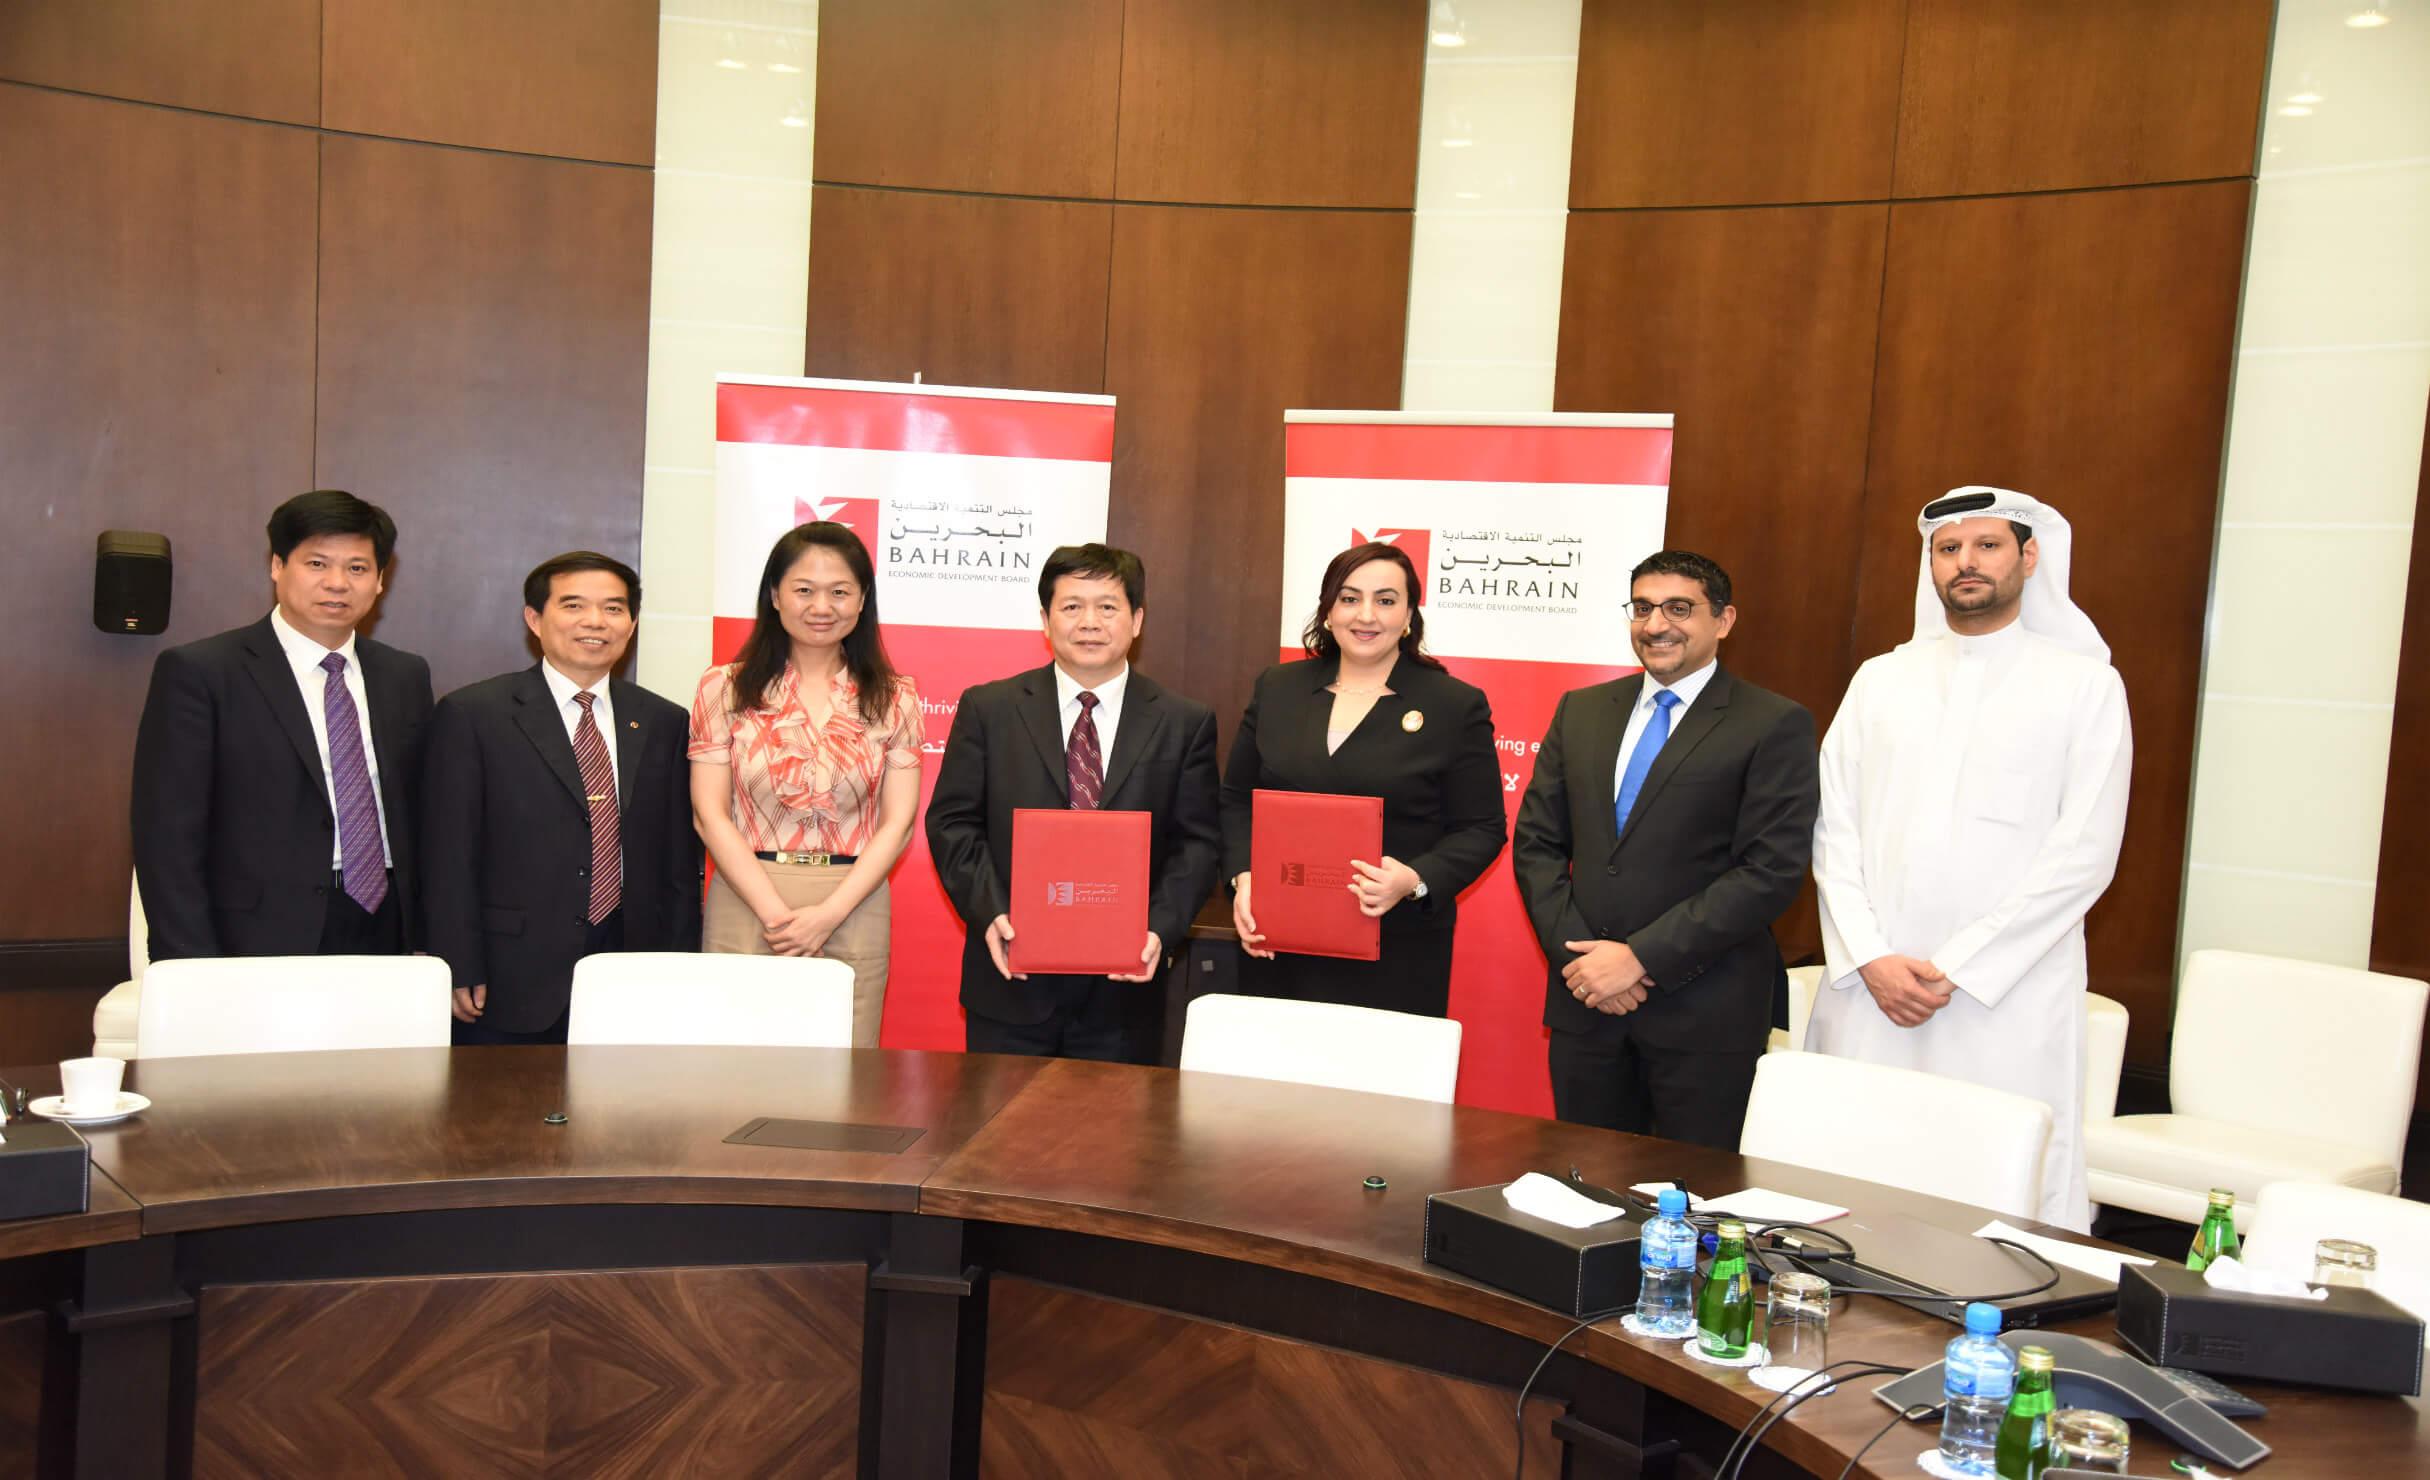 One Hundred Chinese Business Delegates Visit Bahrain